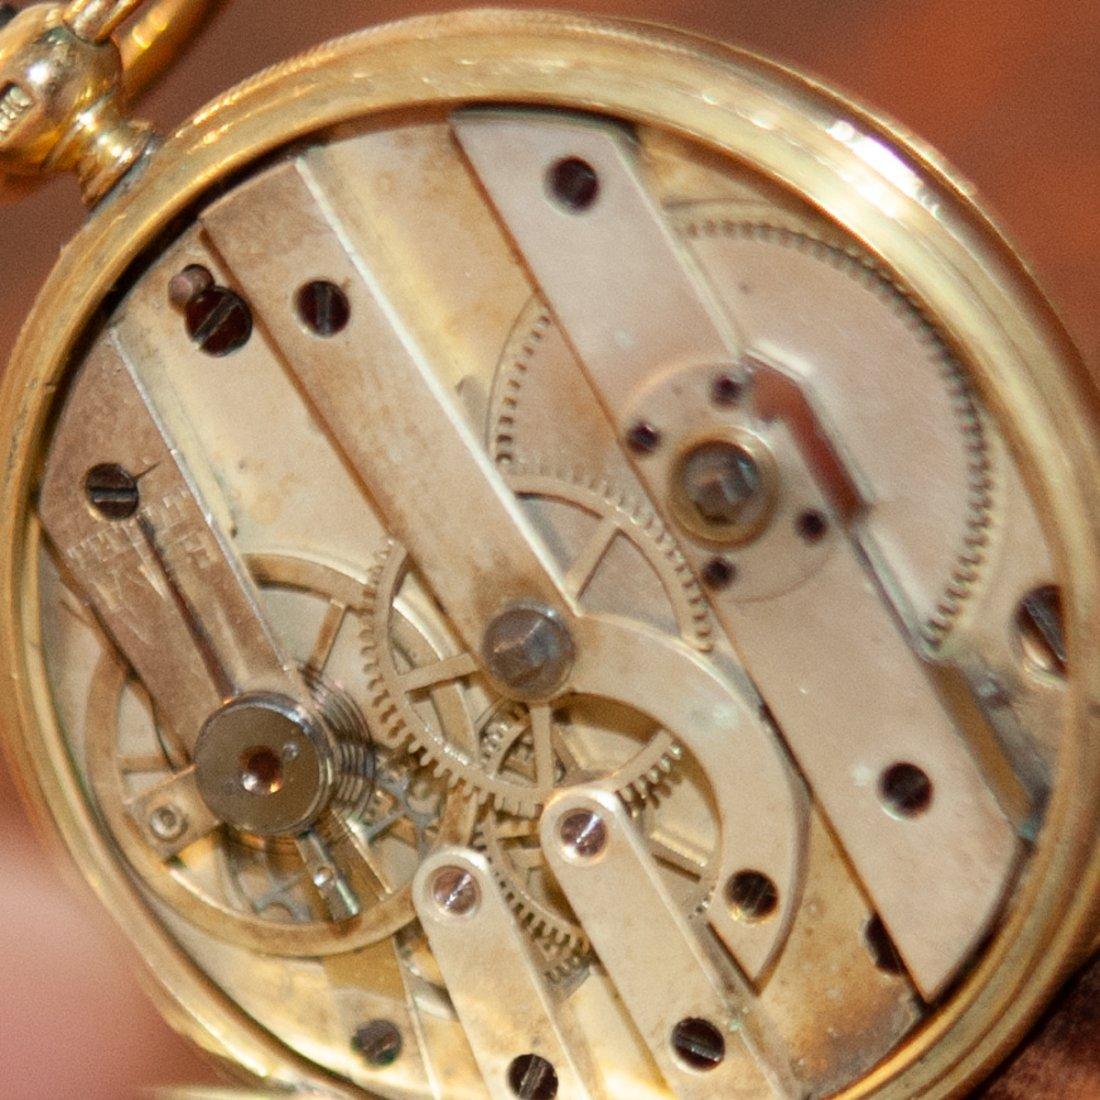 Vacheron 18kt Gold Enameled Pocket Watch - 10